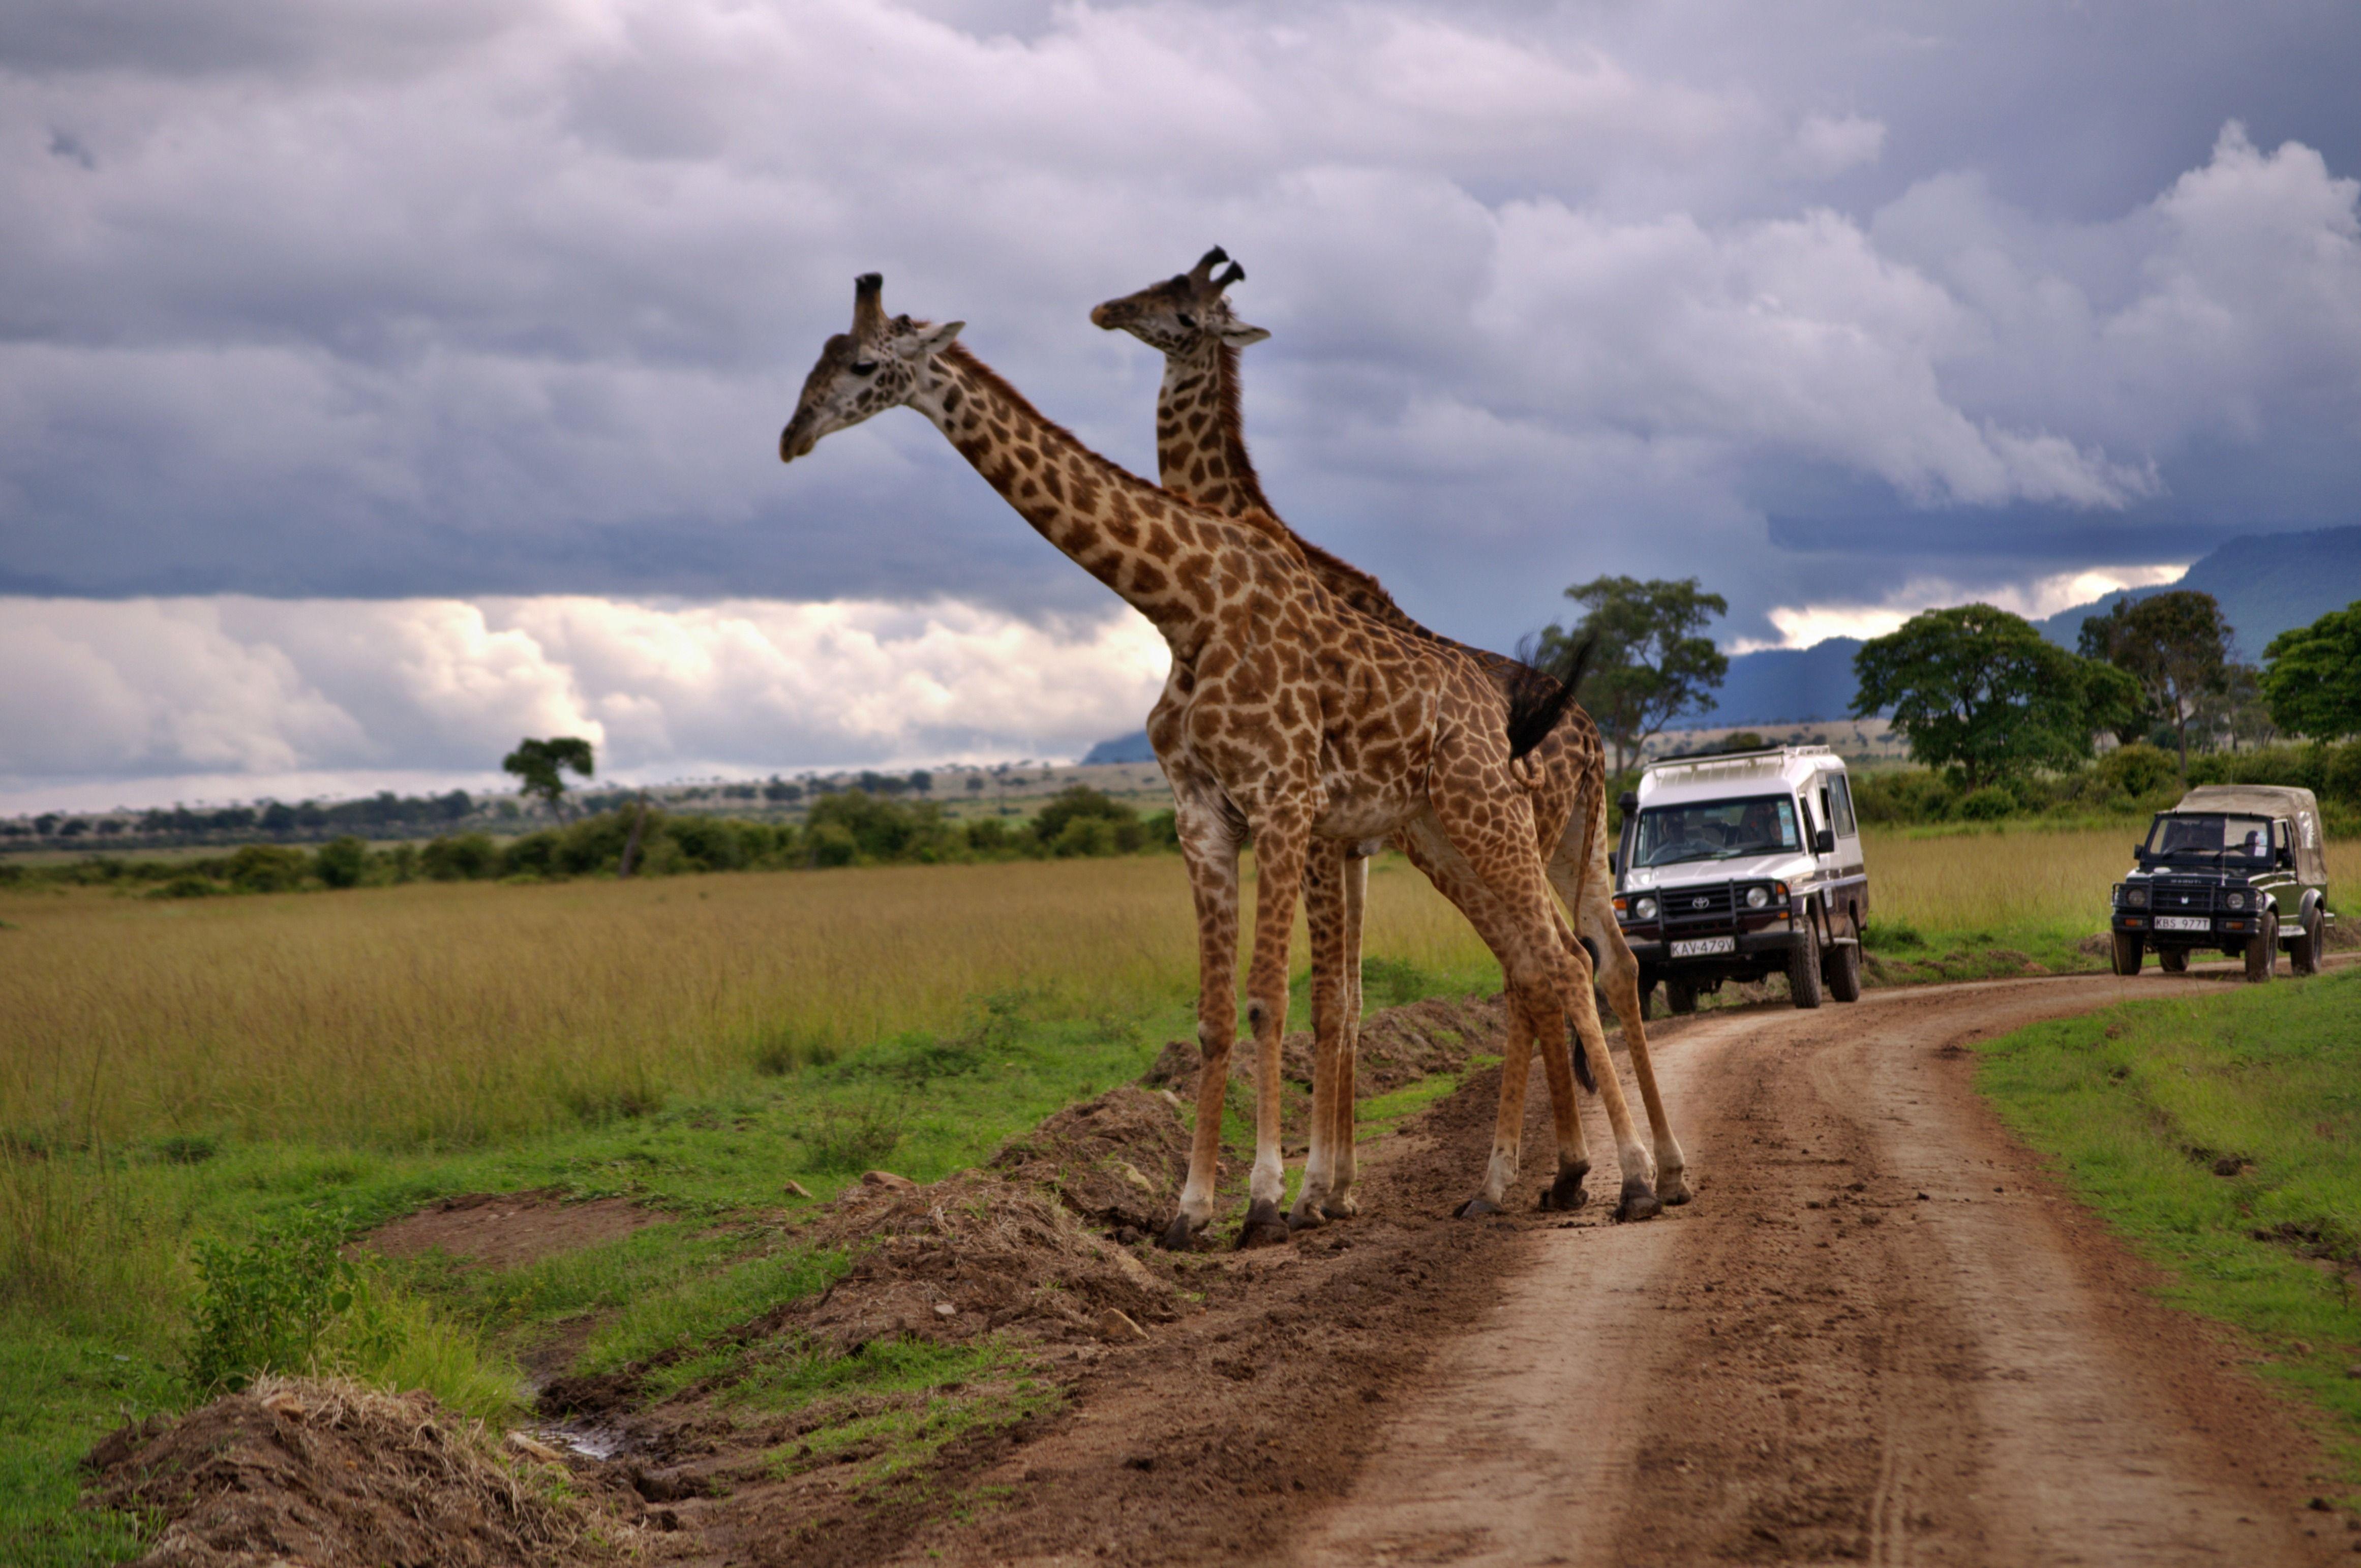 11-DAYS BEST OF KENYA AND TANZANIA BUDGET SAFARI MAASAI MARA